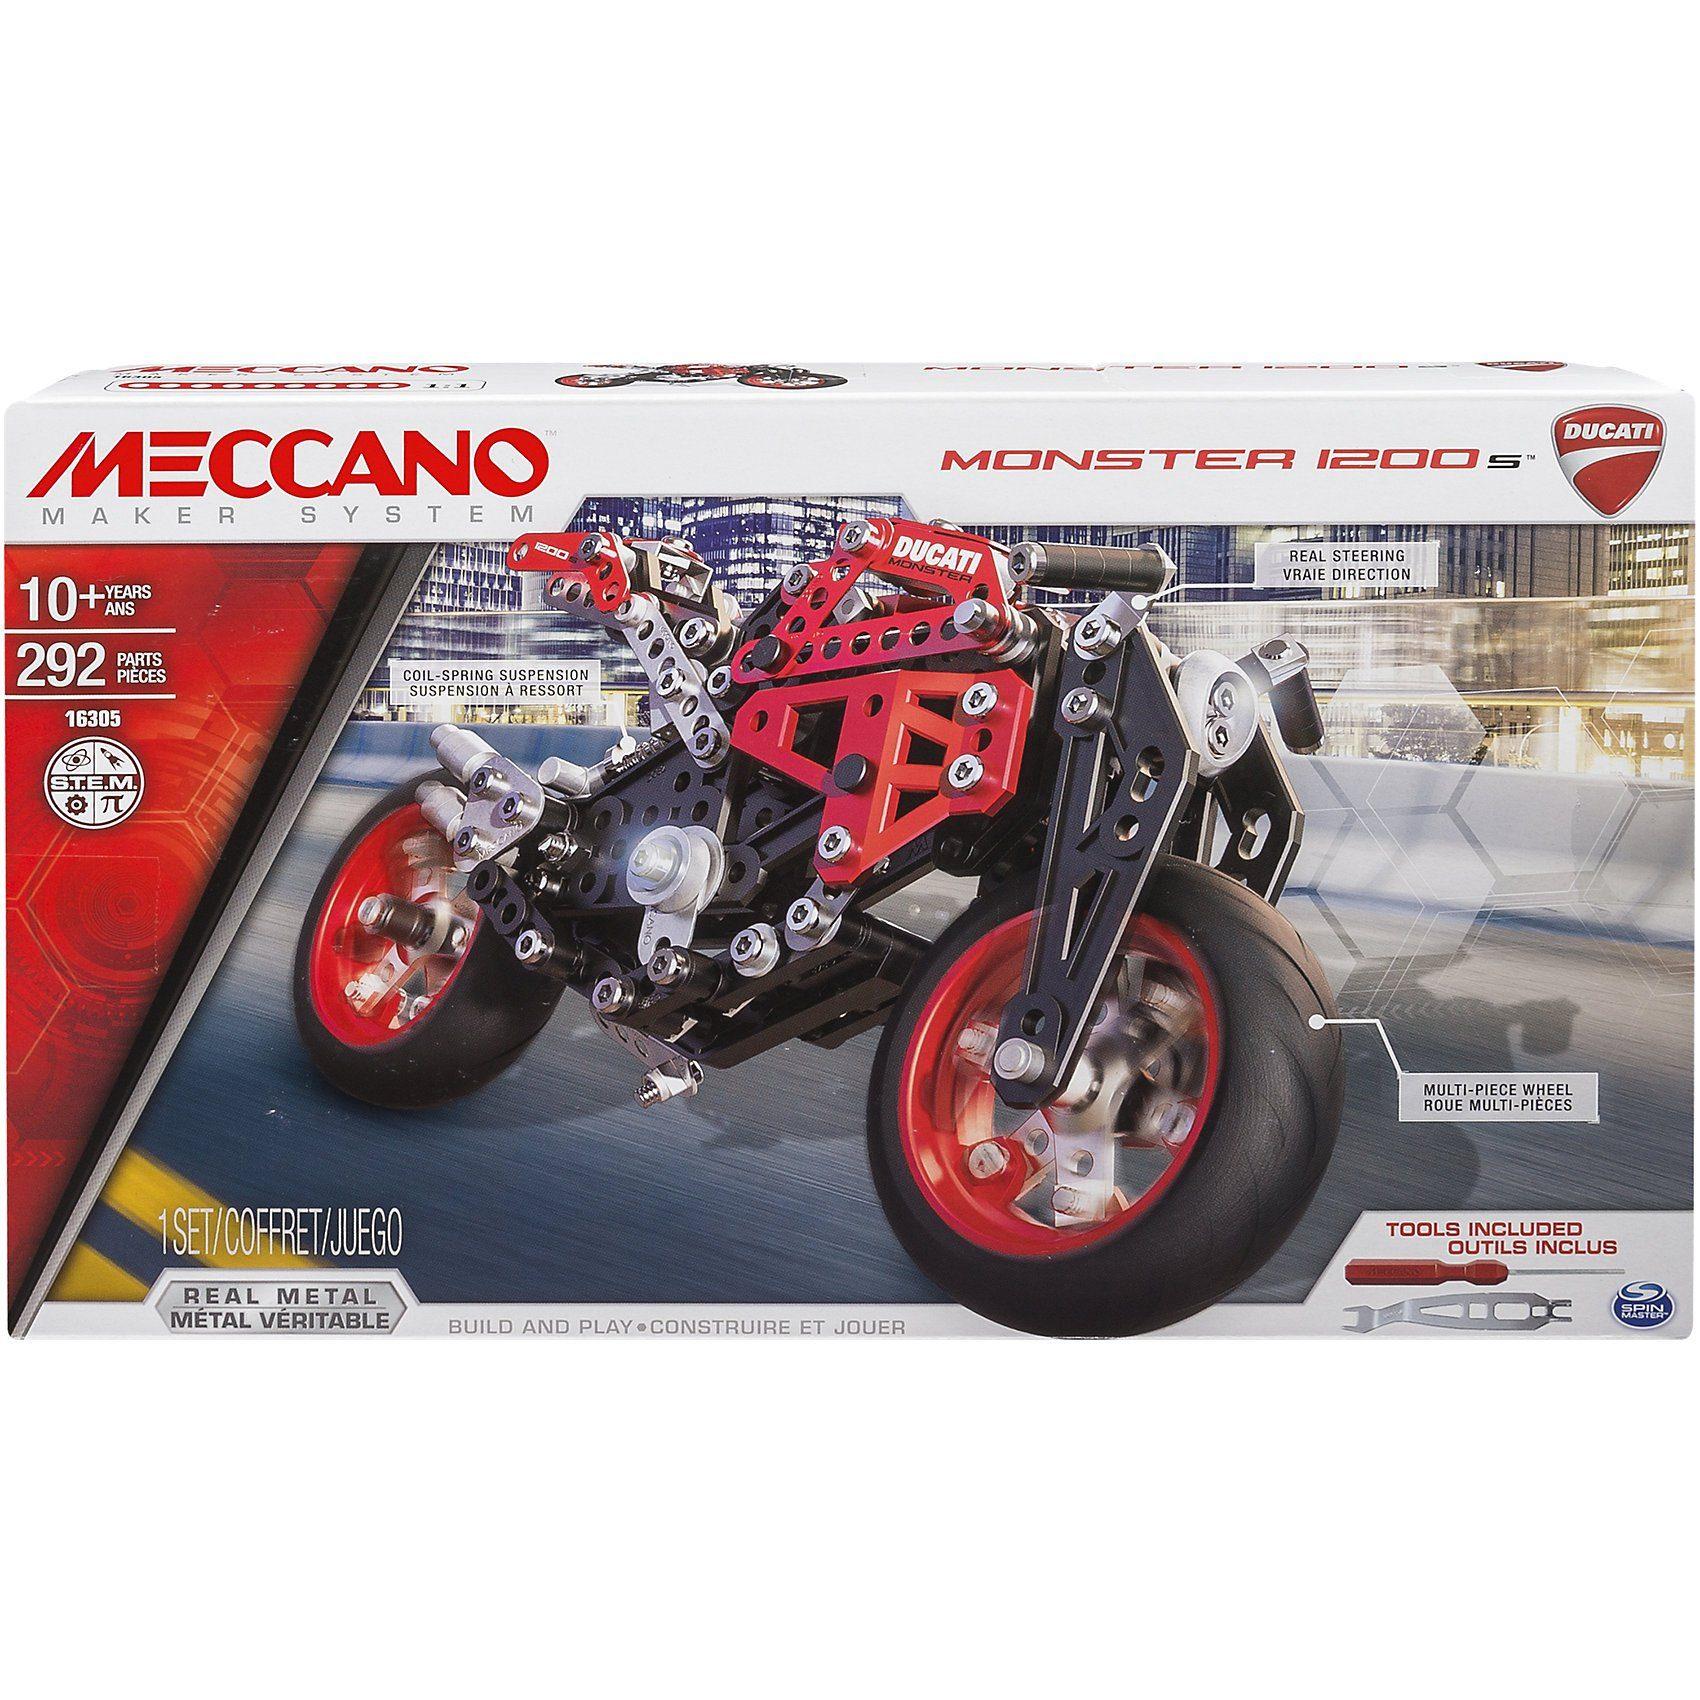 Meccano Elite Motorcycle Ducati